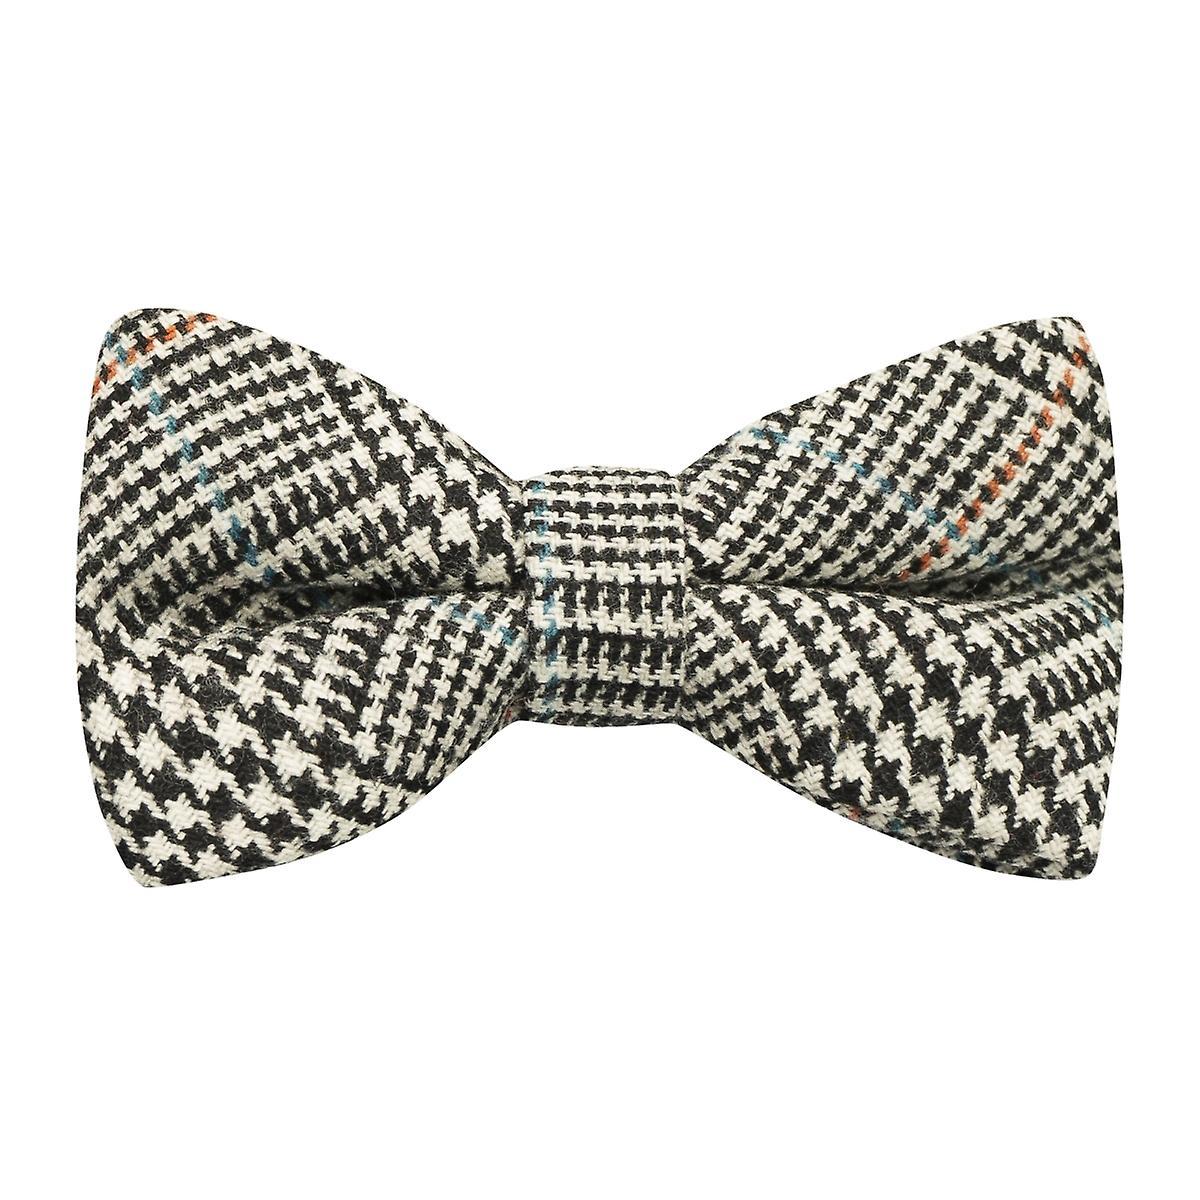 Black & White Dogtooth Tweed Bow Tie